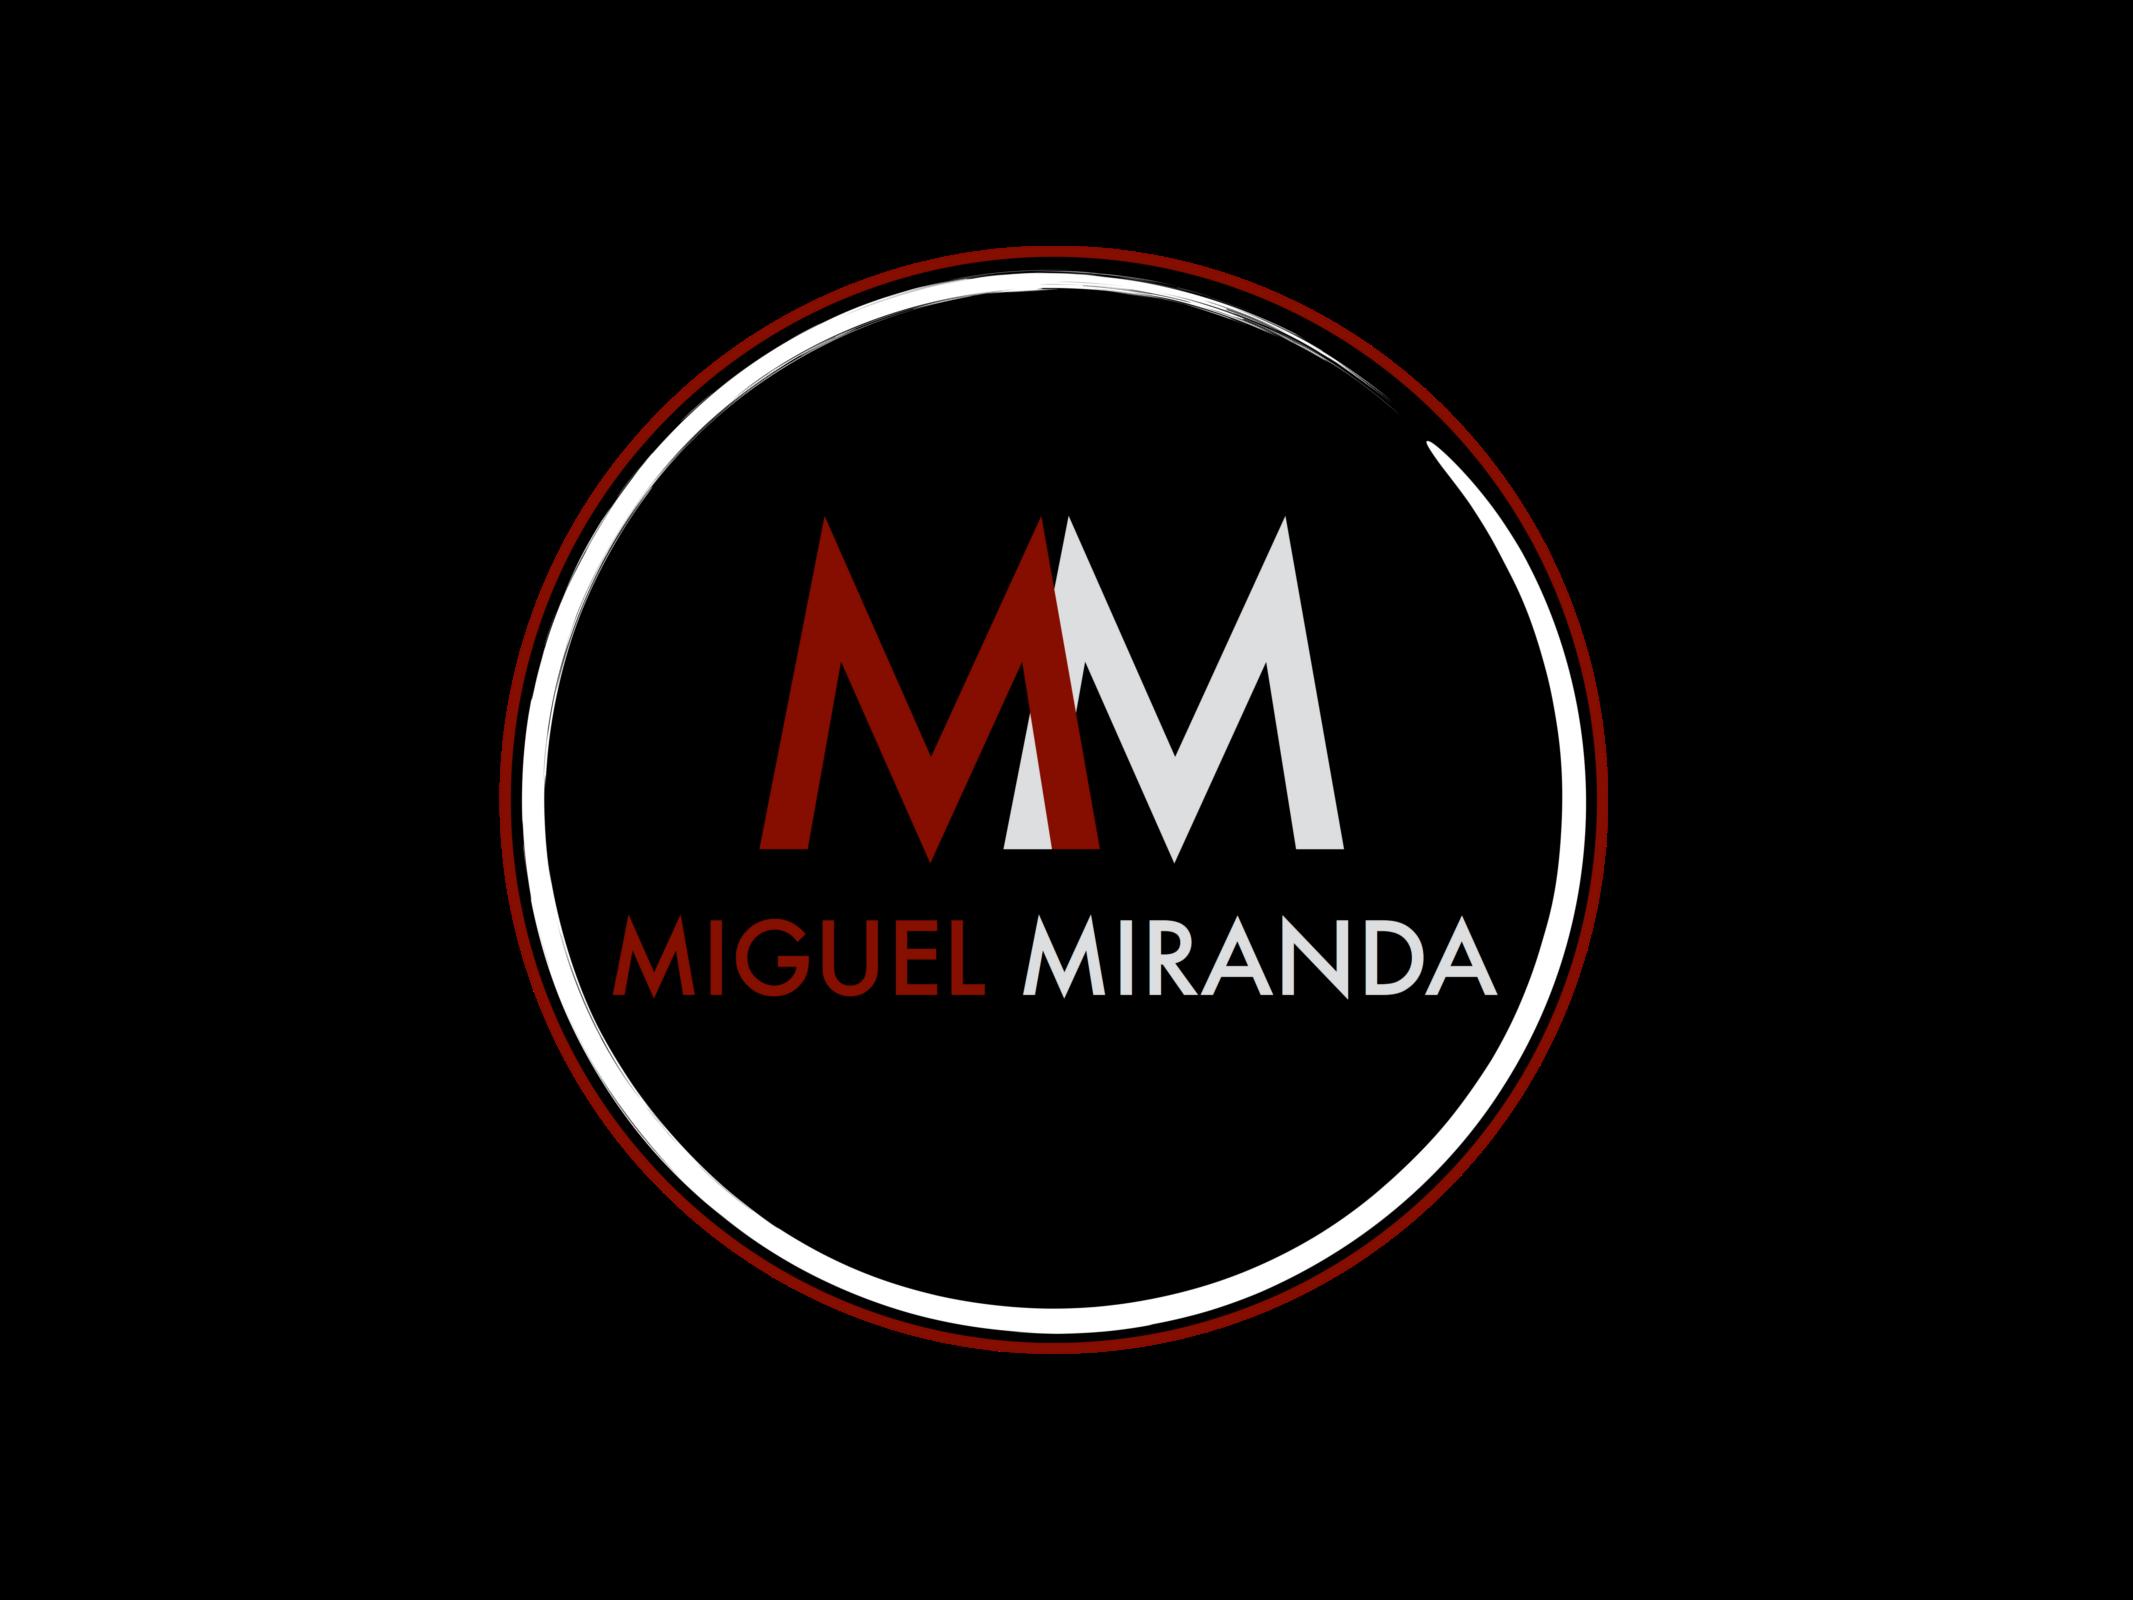 Arbeitgeber: Miguel Miranda Partnerunternehmen